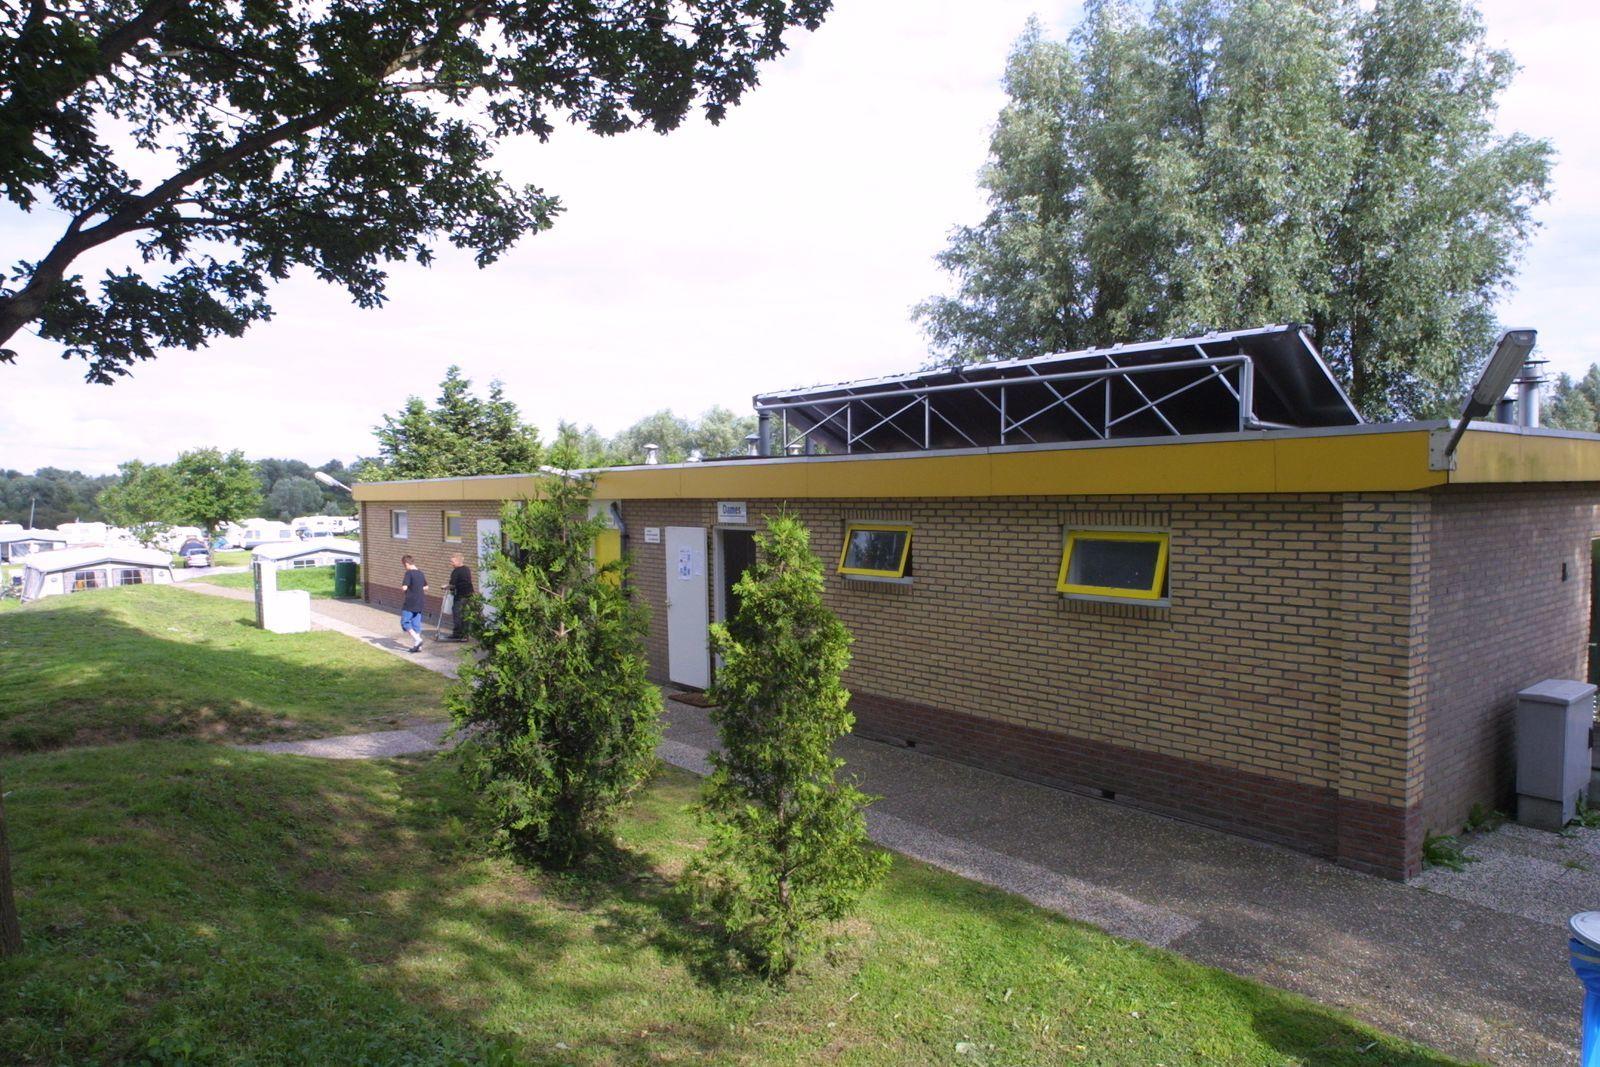 Camping site IJsselweide